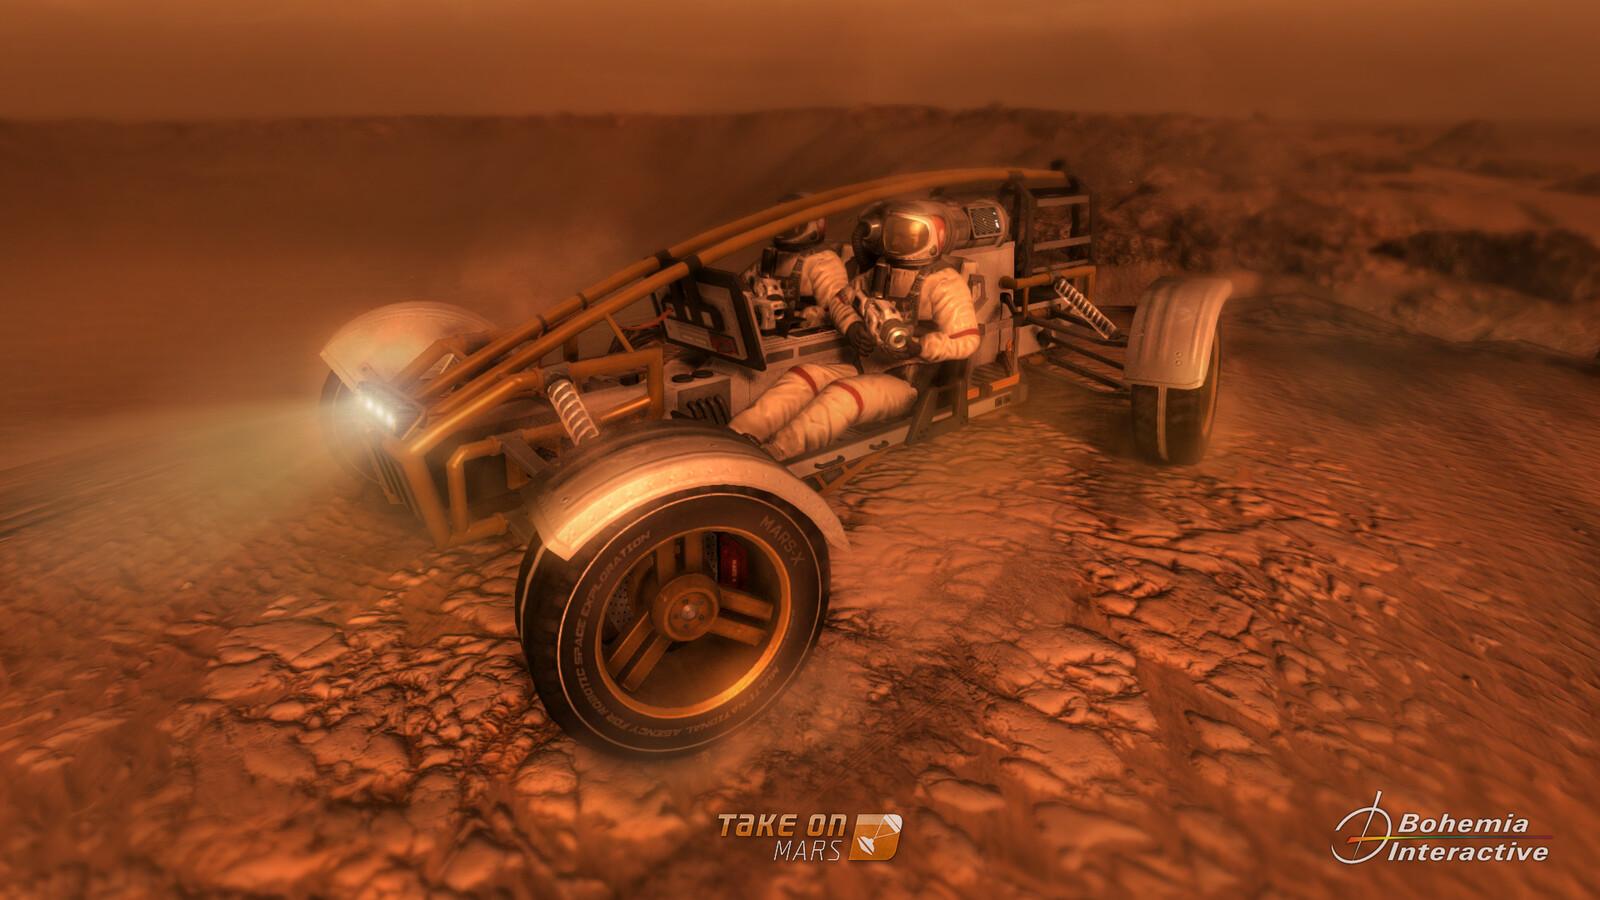 Take on Mars assets